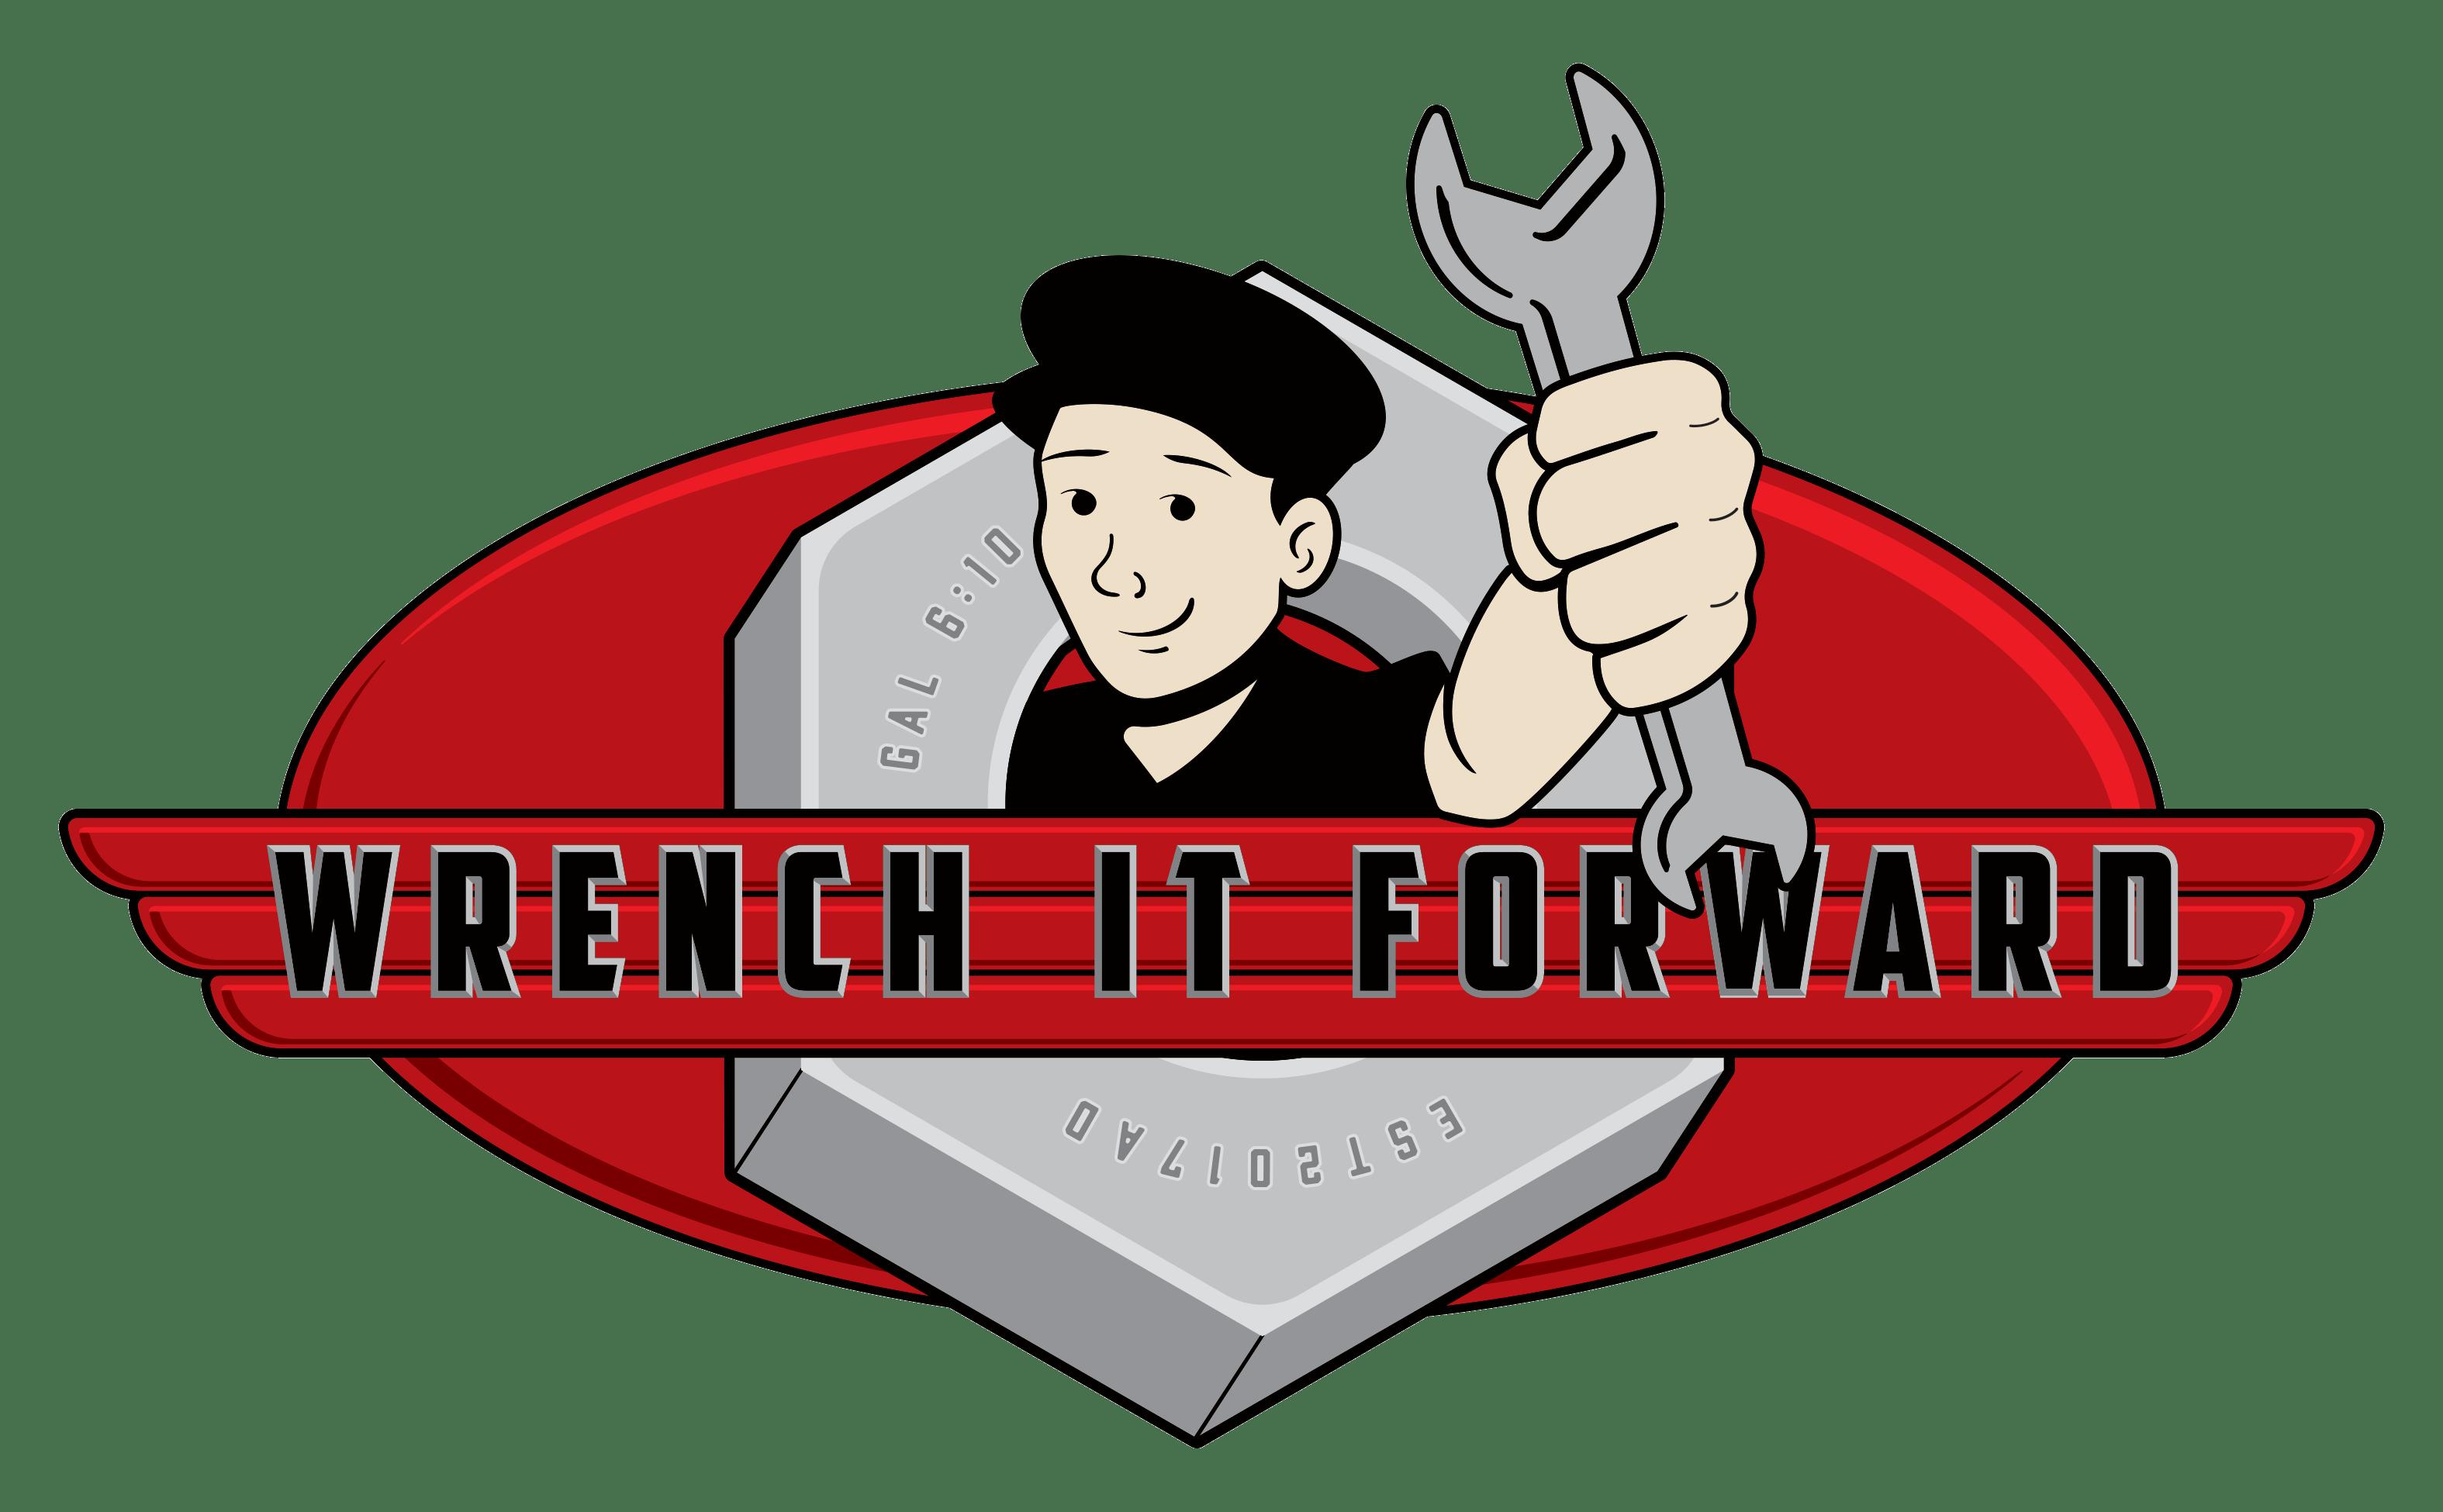 Wrench It Forward